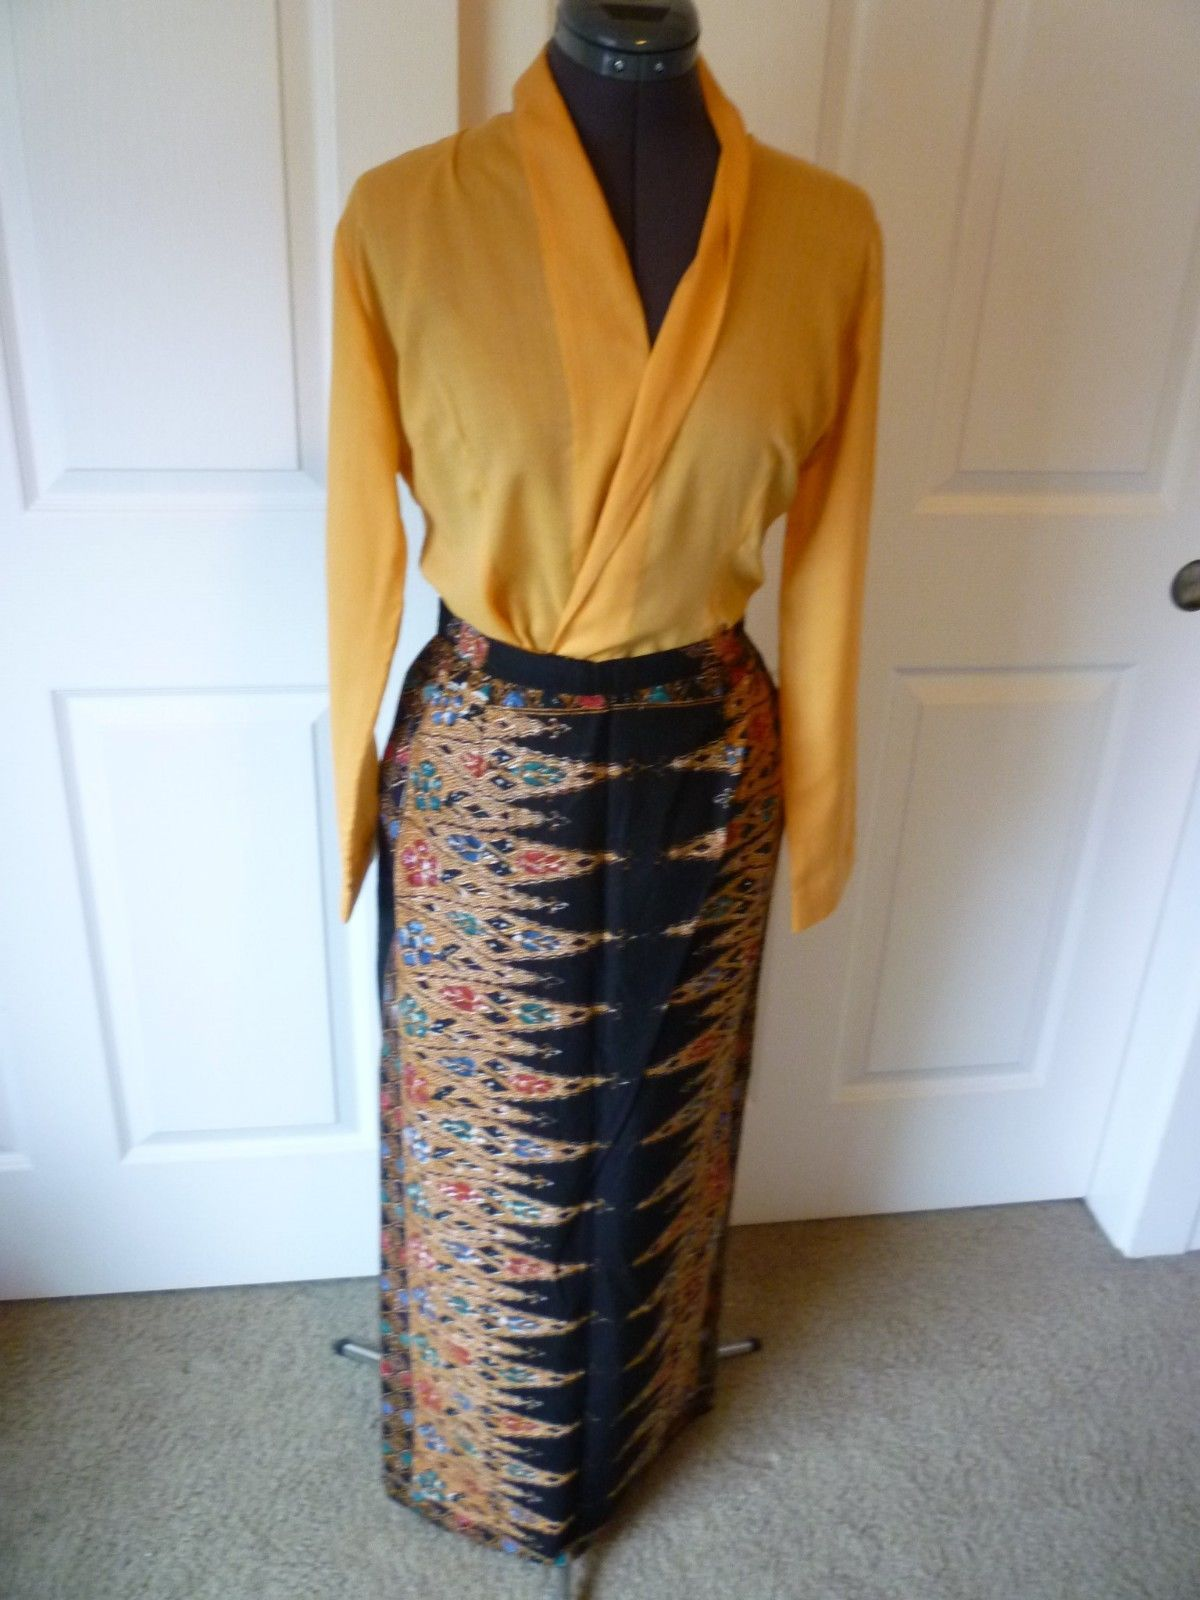 Girls Full Super Wide Skirt /& Top Set Dress W//Ribbons For Folklorico Dances NWOT